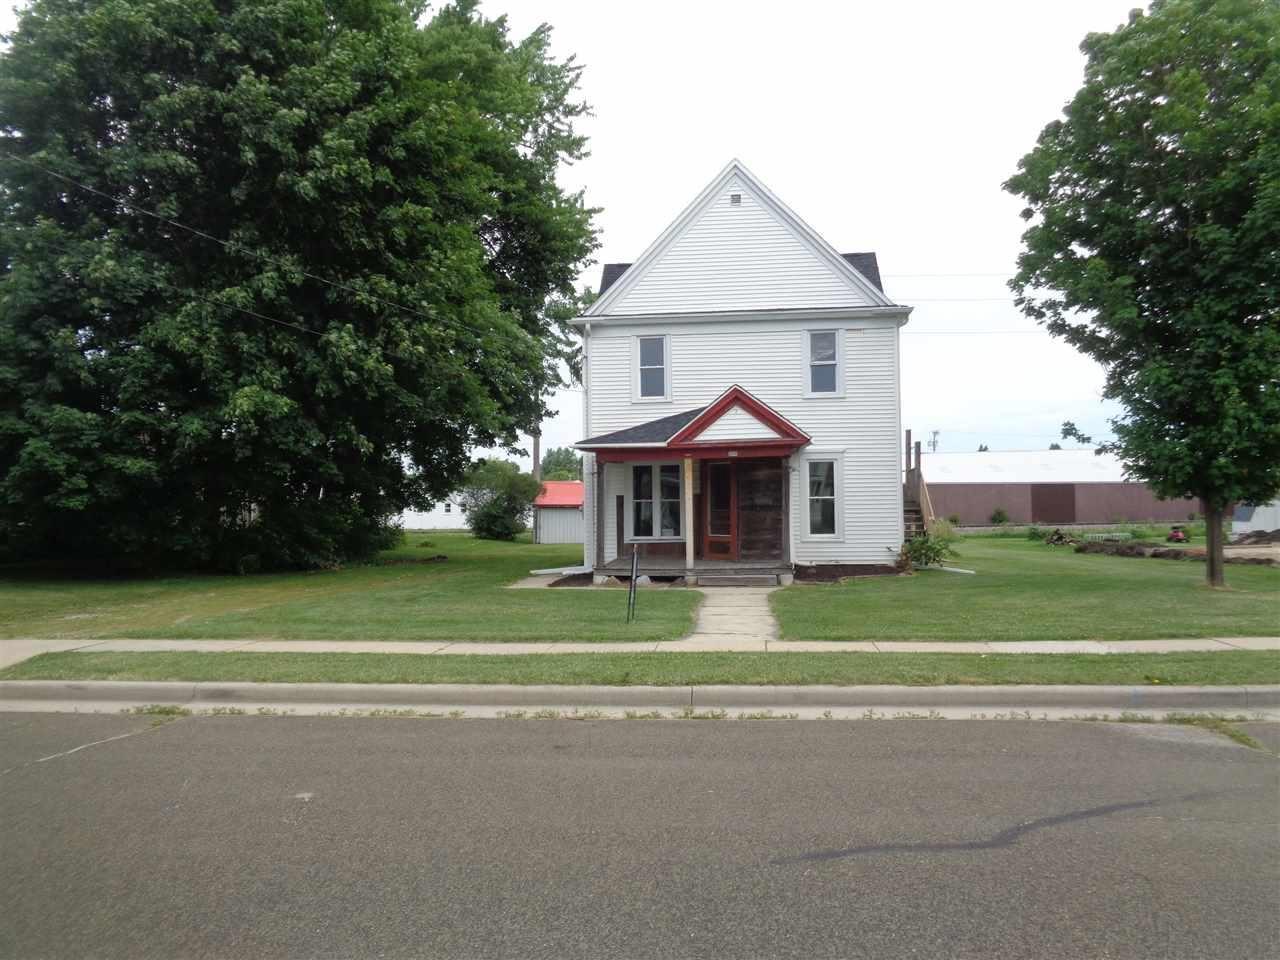 209 Center St, Randolph, WI 53956 - MLS#: 1872525